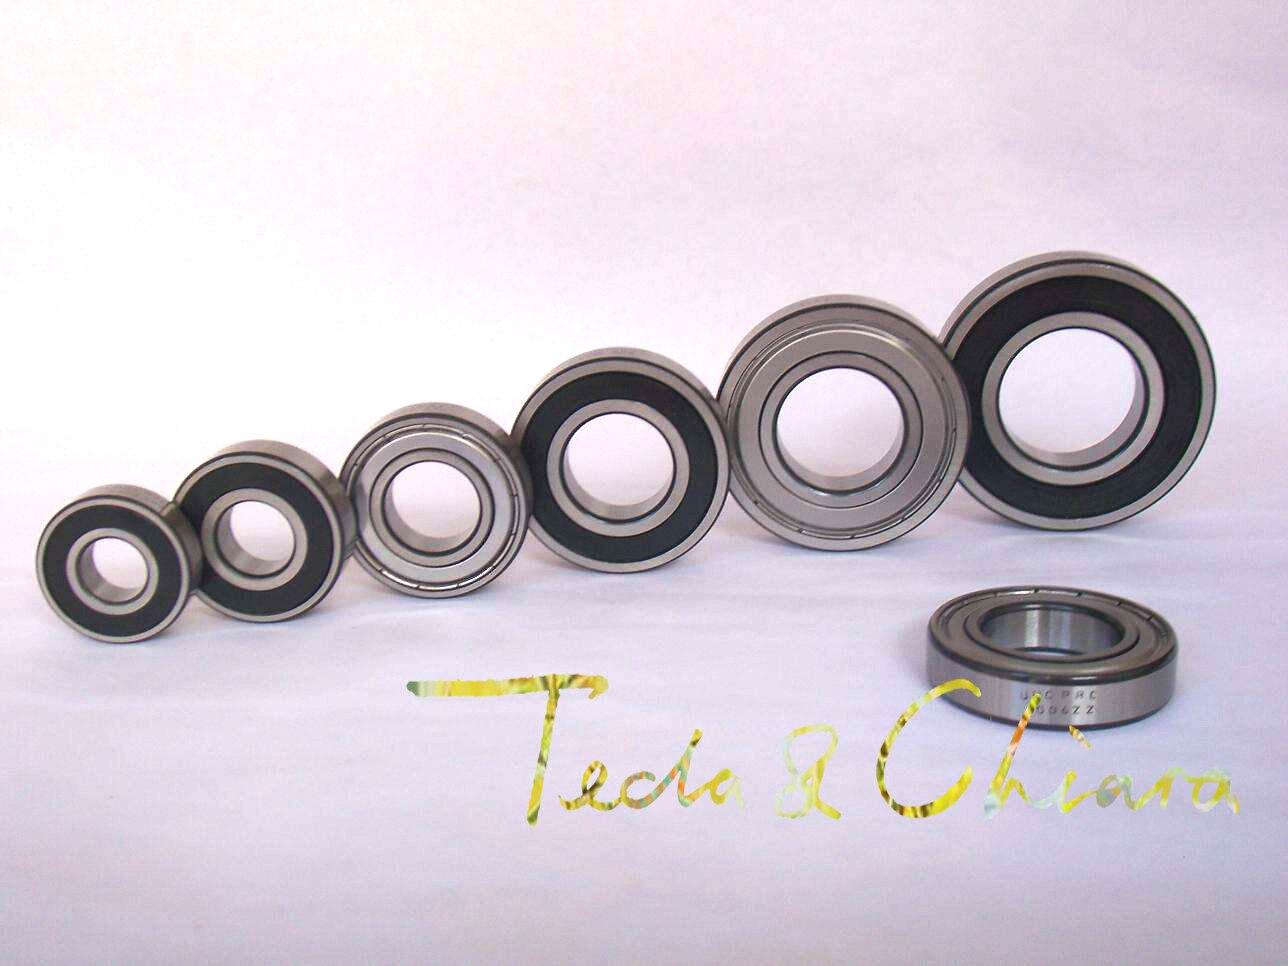 677ZZ MR117 MR117ZZ MR117RS MR117-2Z MR117Z MR117-2RS 677 677RS ZZ RS RZ 2RZ Deep Groove Ball Bearings 7 x 11 x 3mm High Quality 5 pcs double sealed 3 x 7 x 3mm deep groove ball bearings page 4